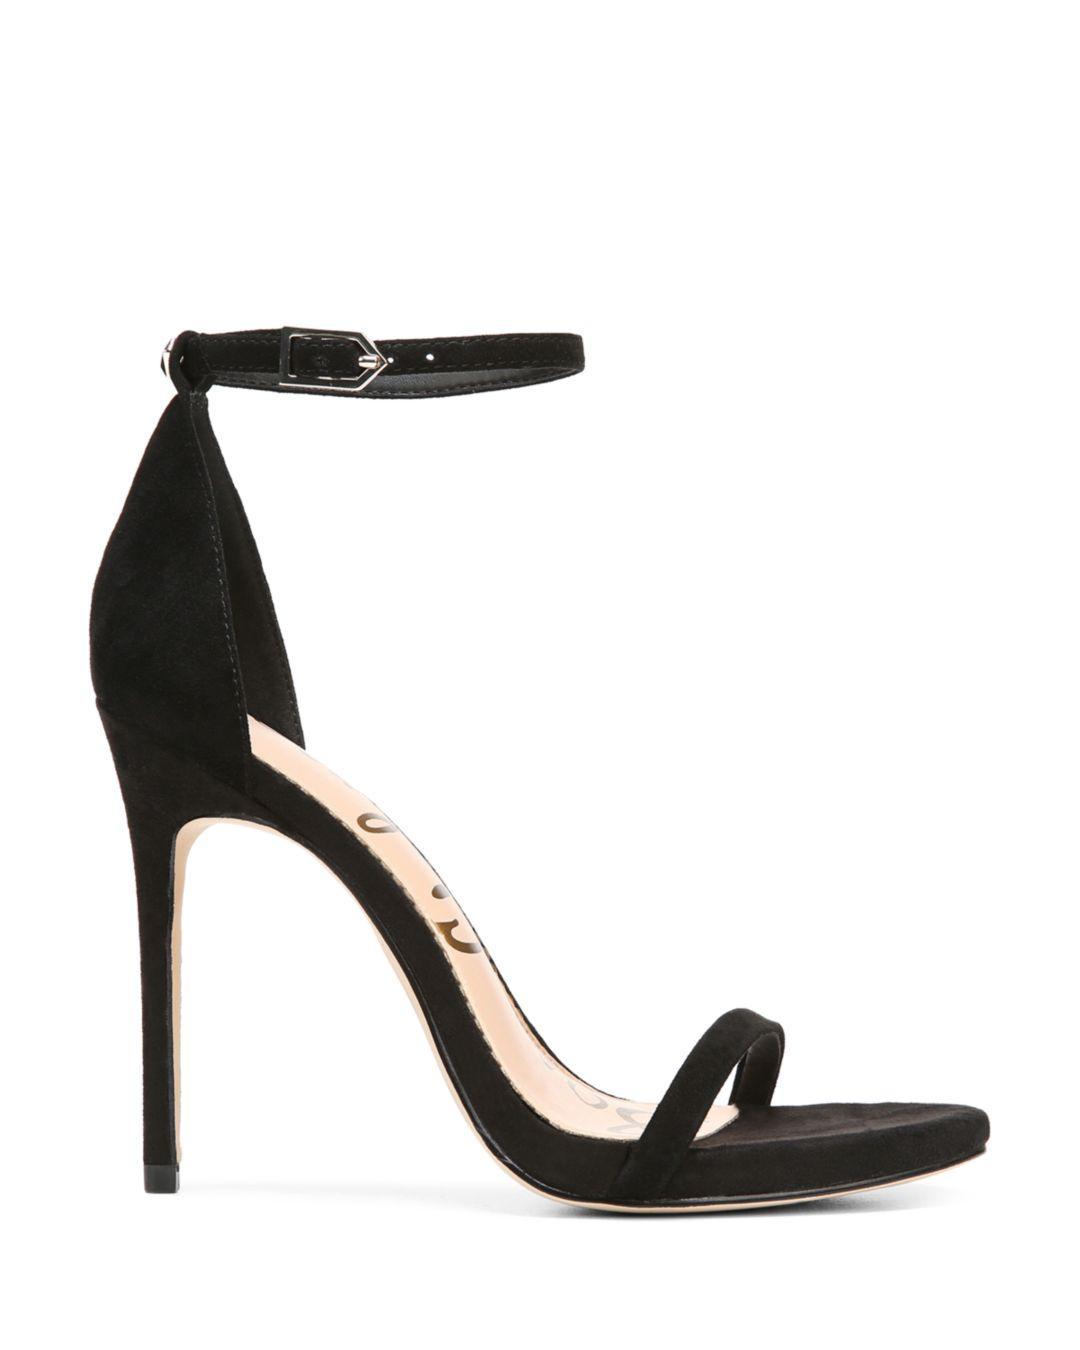 61b552427a81 Lyst - Sam Edelman Women s Ariella High-heel Ankle Strap Sandals in Black -  Save 67%